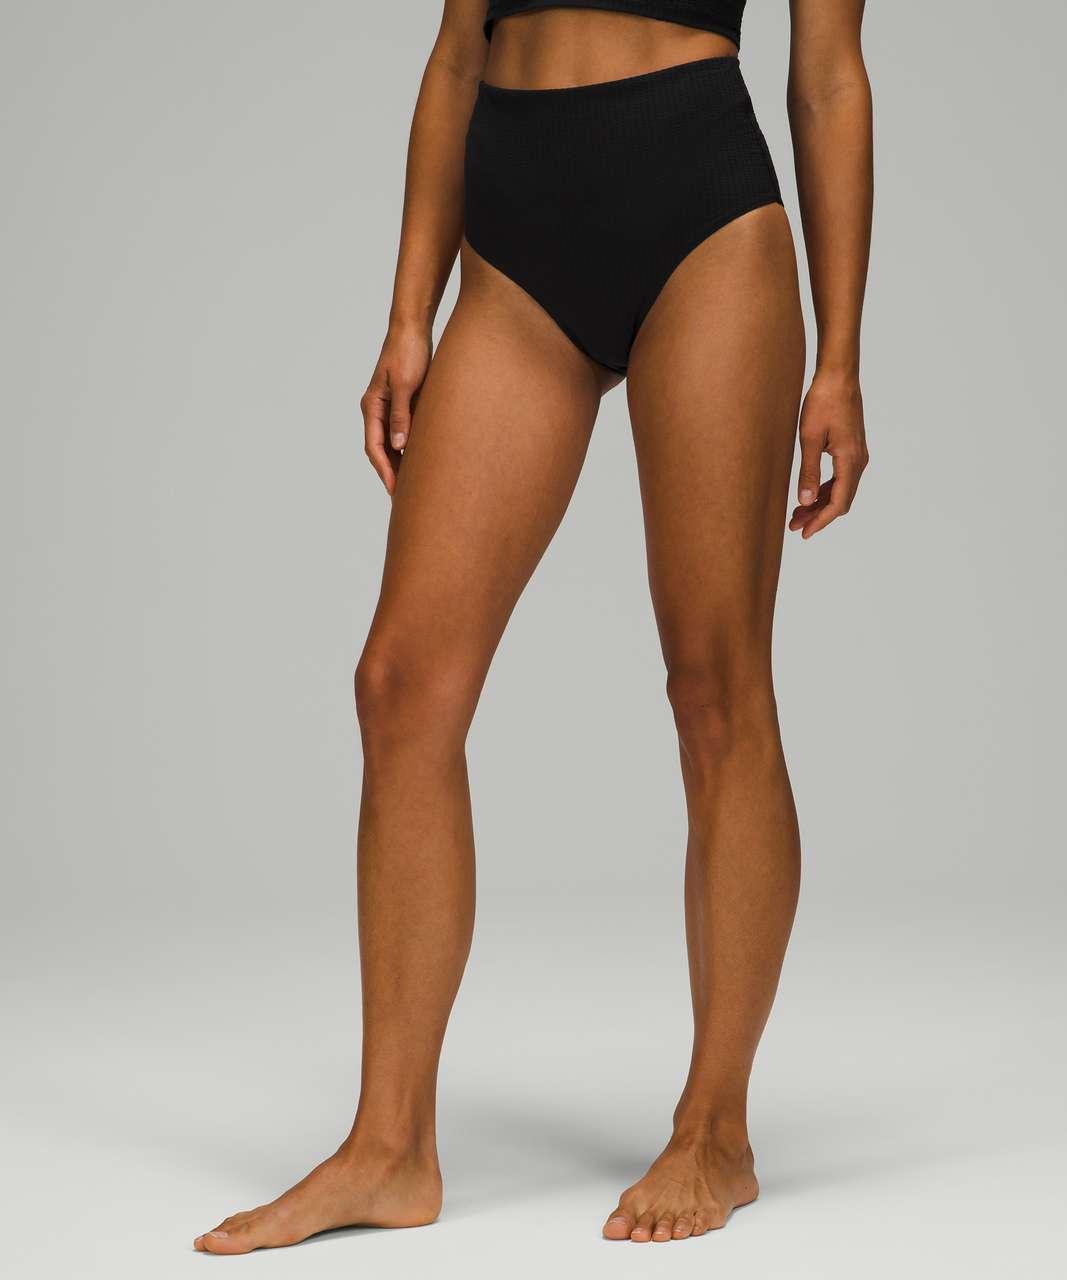 Lululemon Waterside Seersucker High Waist Skimpy Swim Bottom - Black